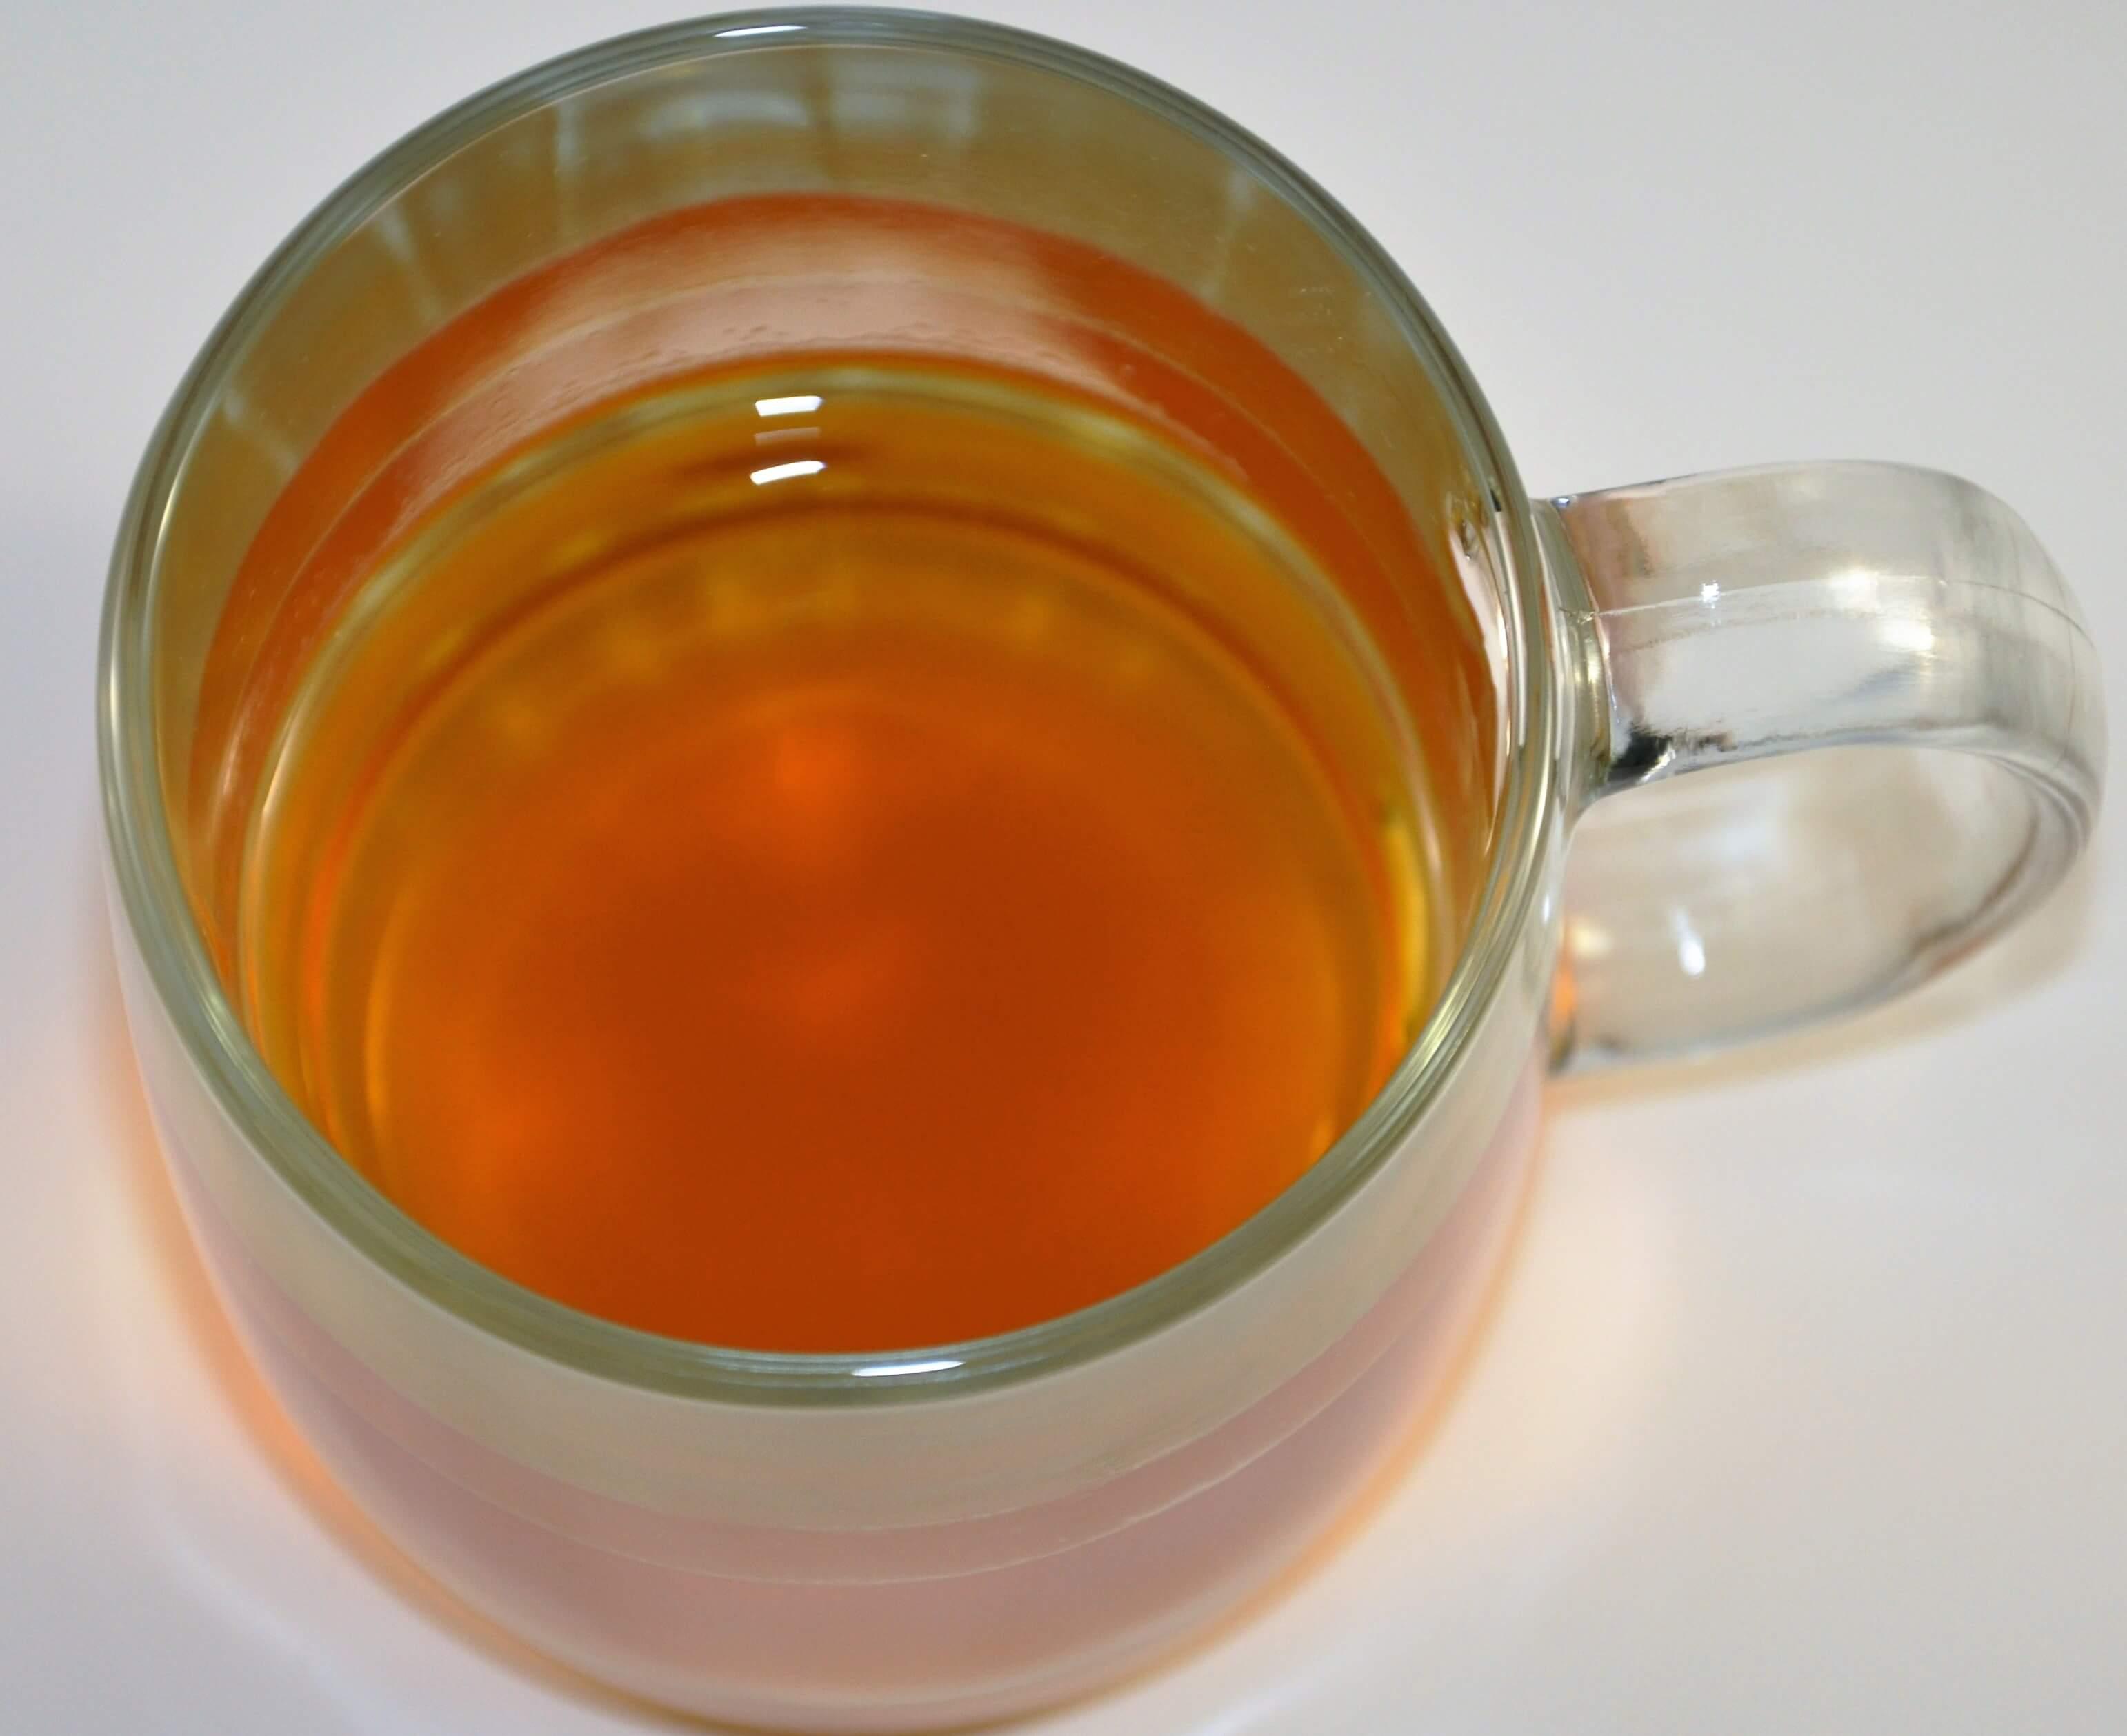 Infused Assam Tea Blended with Ginger